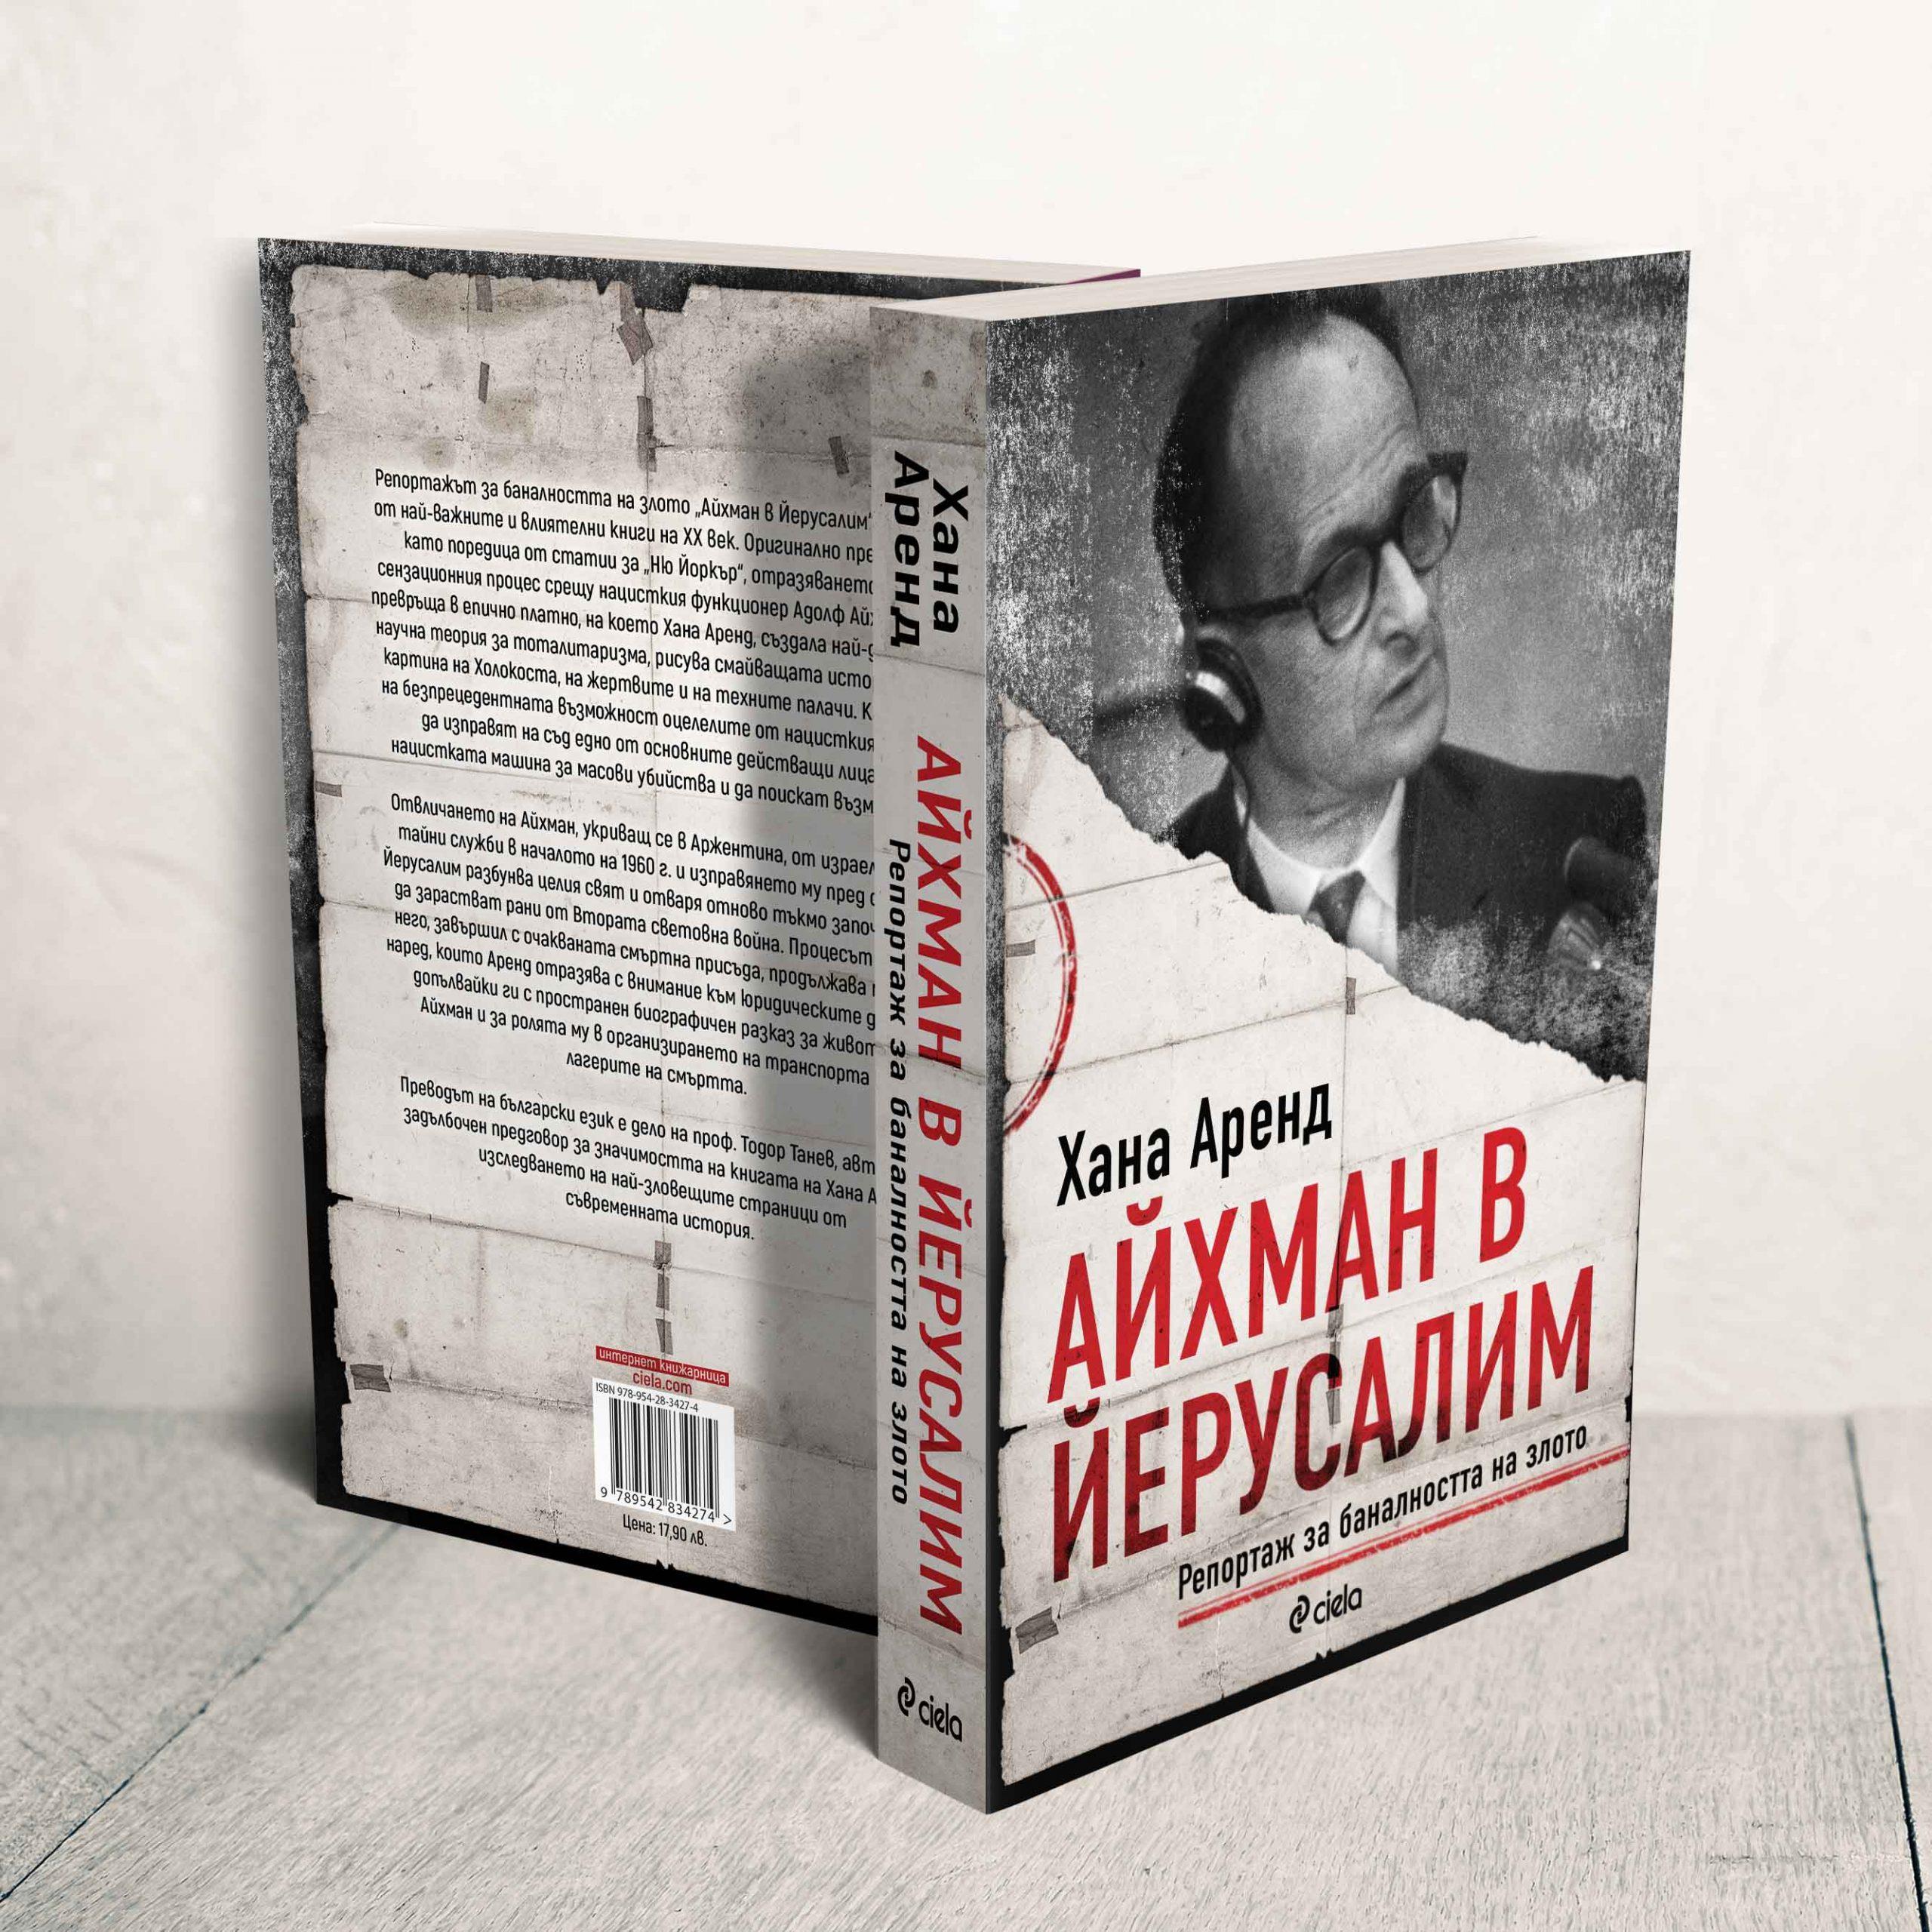 "Излиза ""Айхман в Йерусалим"" от Хана Аренд 27"